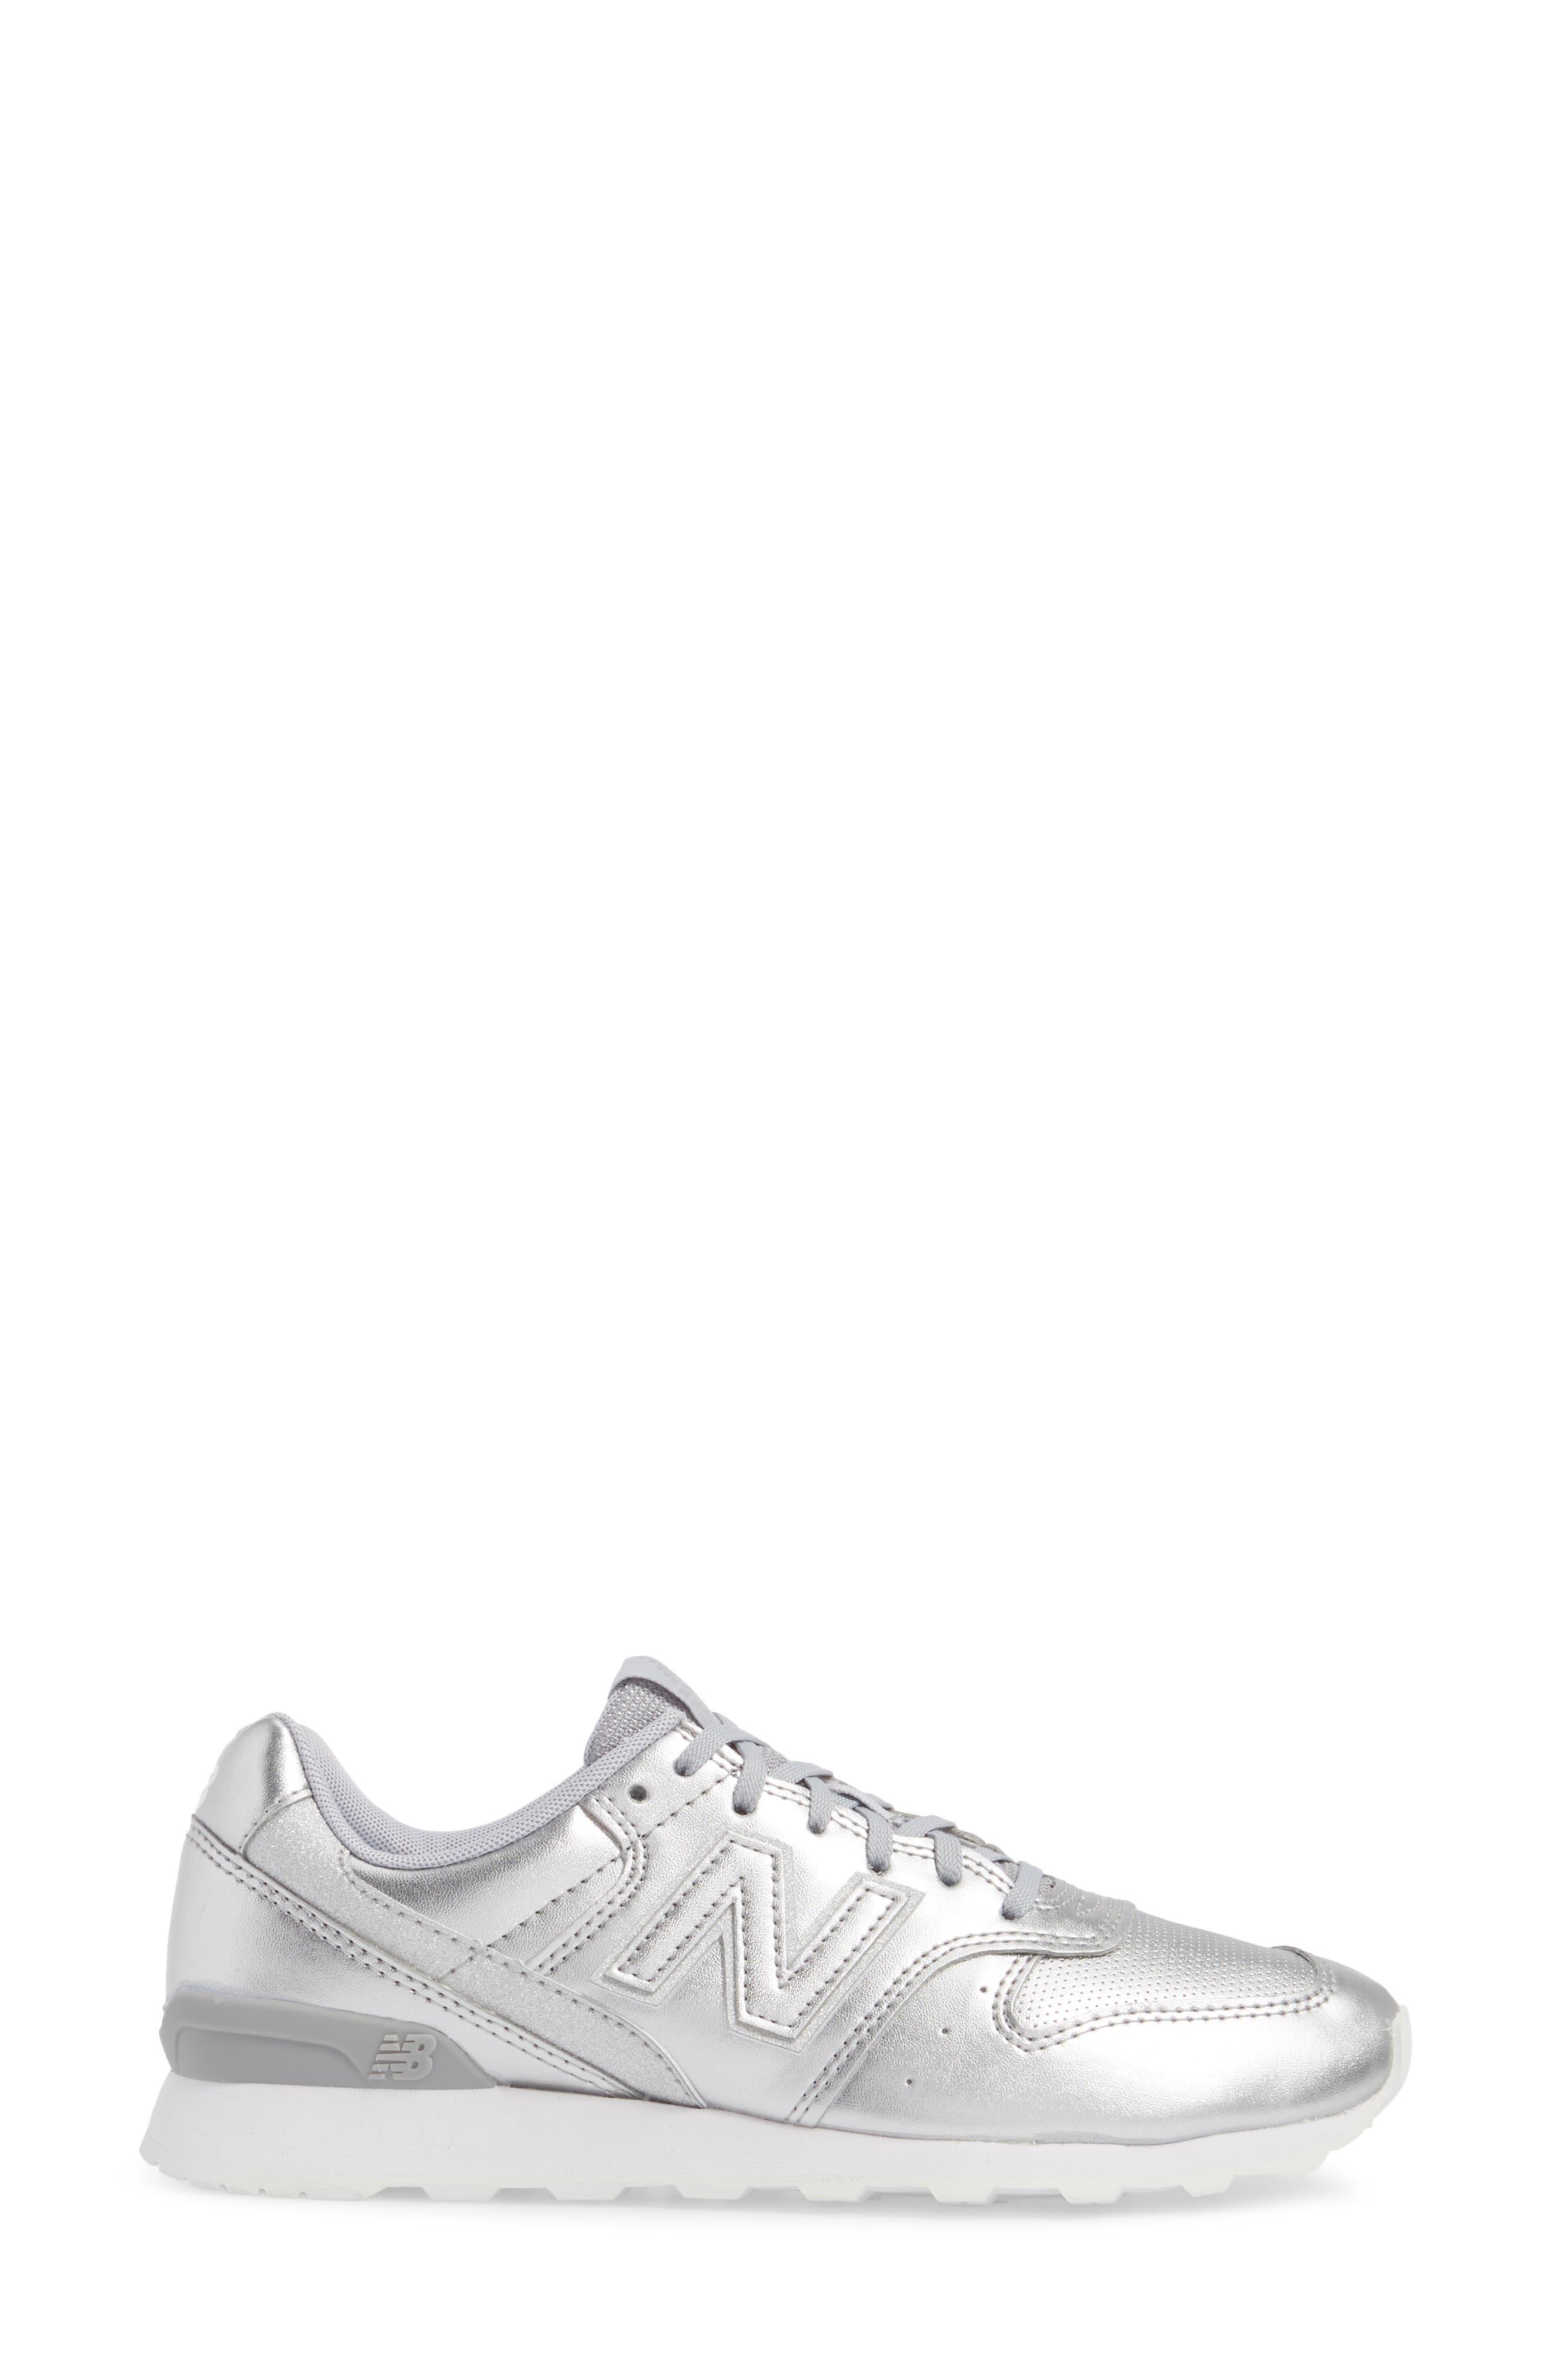 696 Sneaker,                             Alternate thumbnail 3, color,                             Metallic Silver